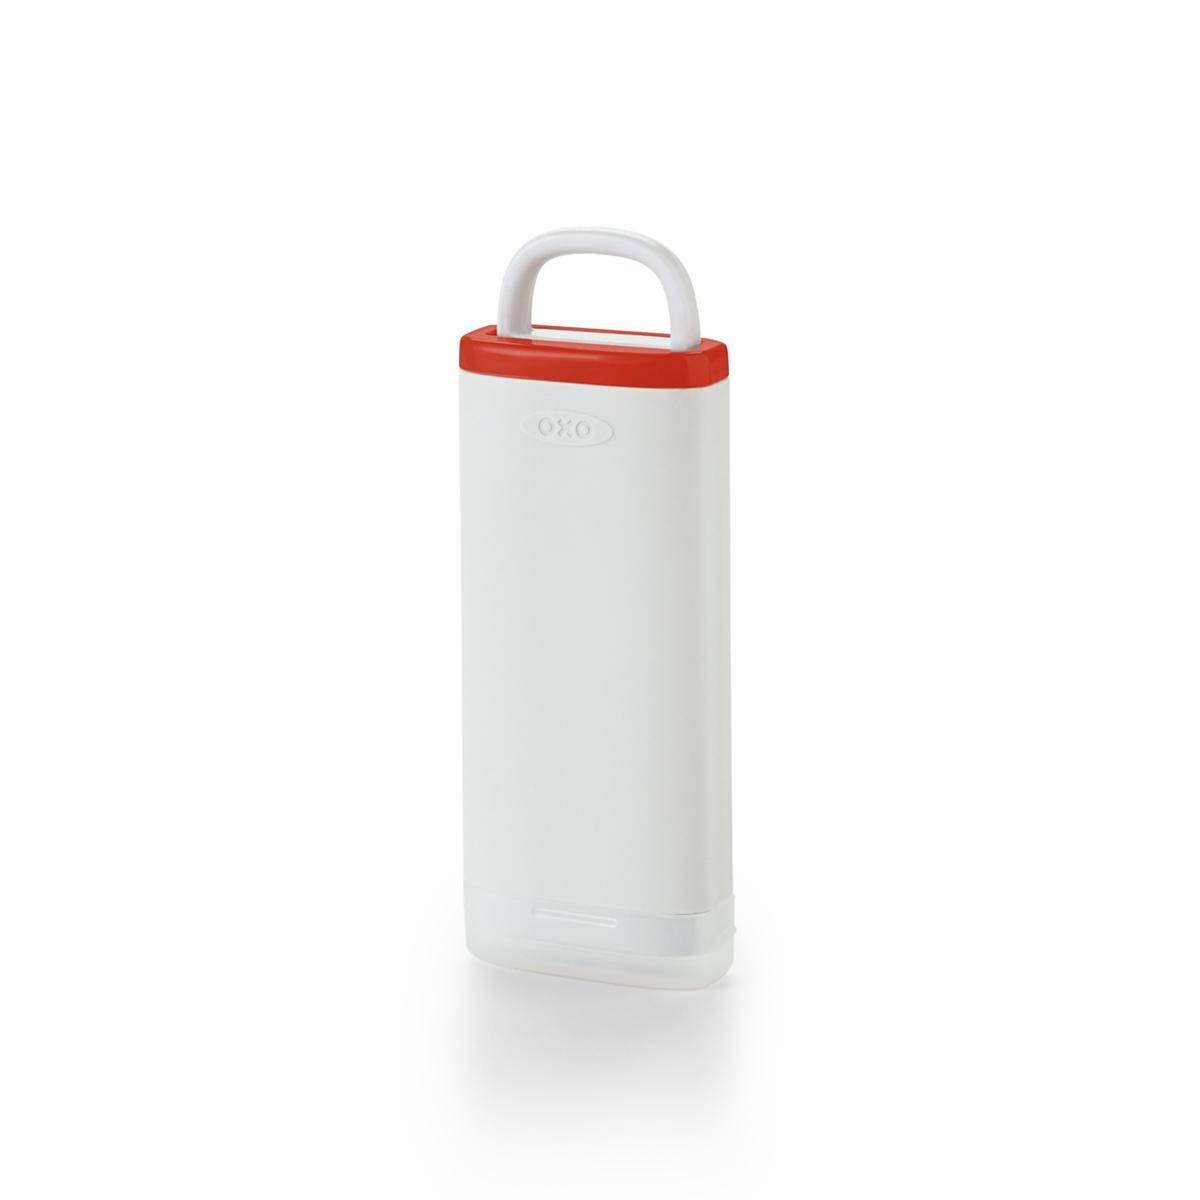 Онлайн каталог PROMENU: Набор: щетка для уборки волос с контейнером OXO CLEANING, 2х11х25 см, белый, 2 предмета                               12168900